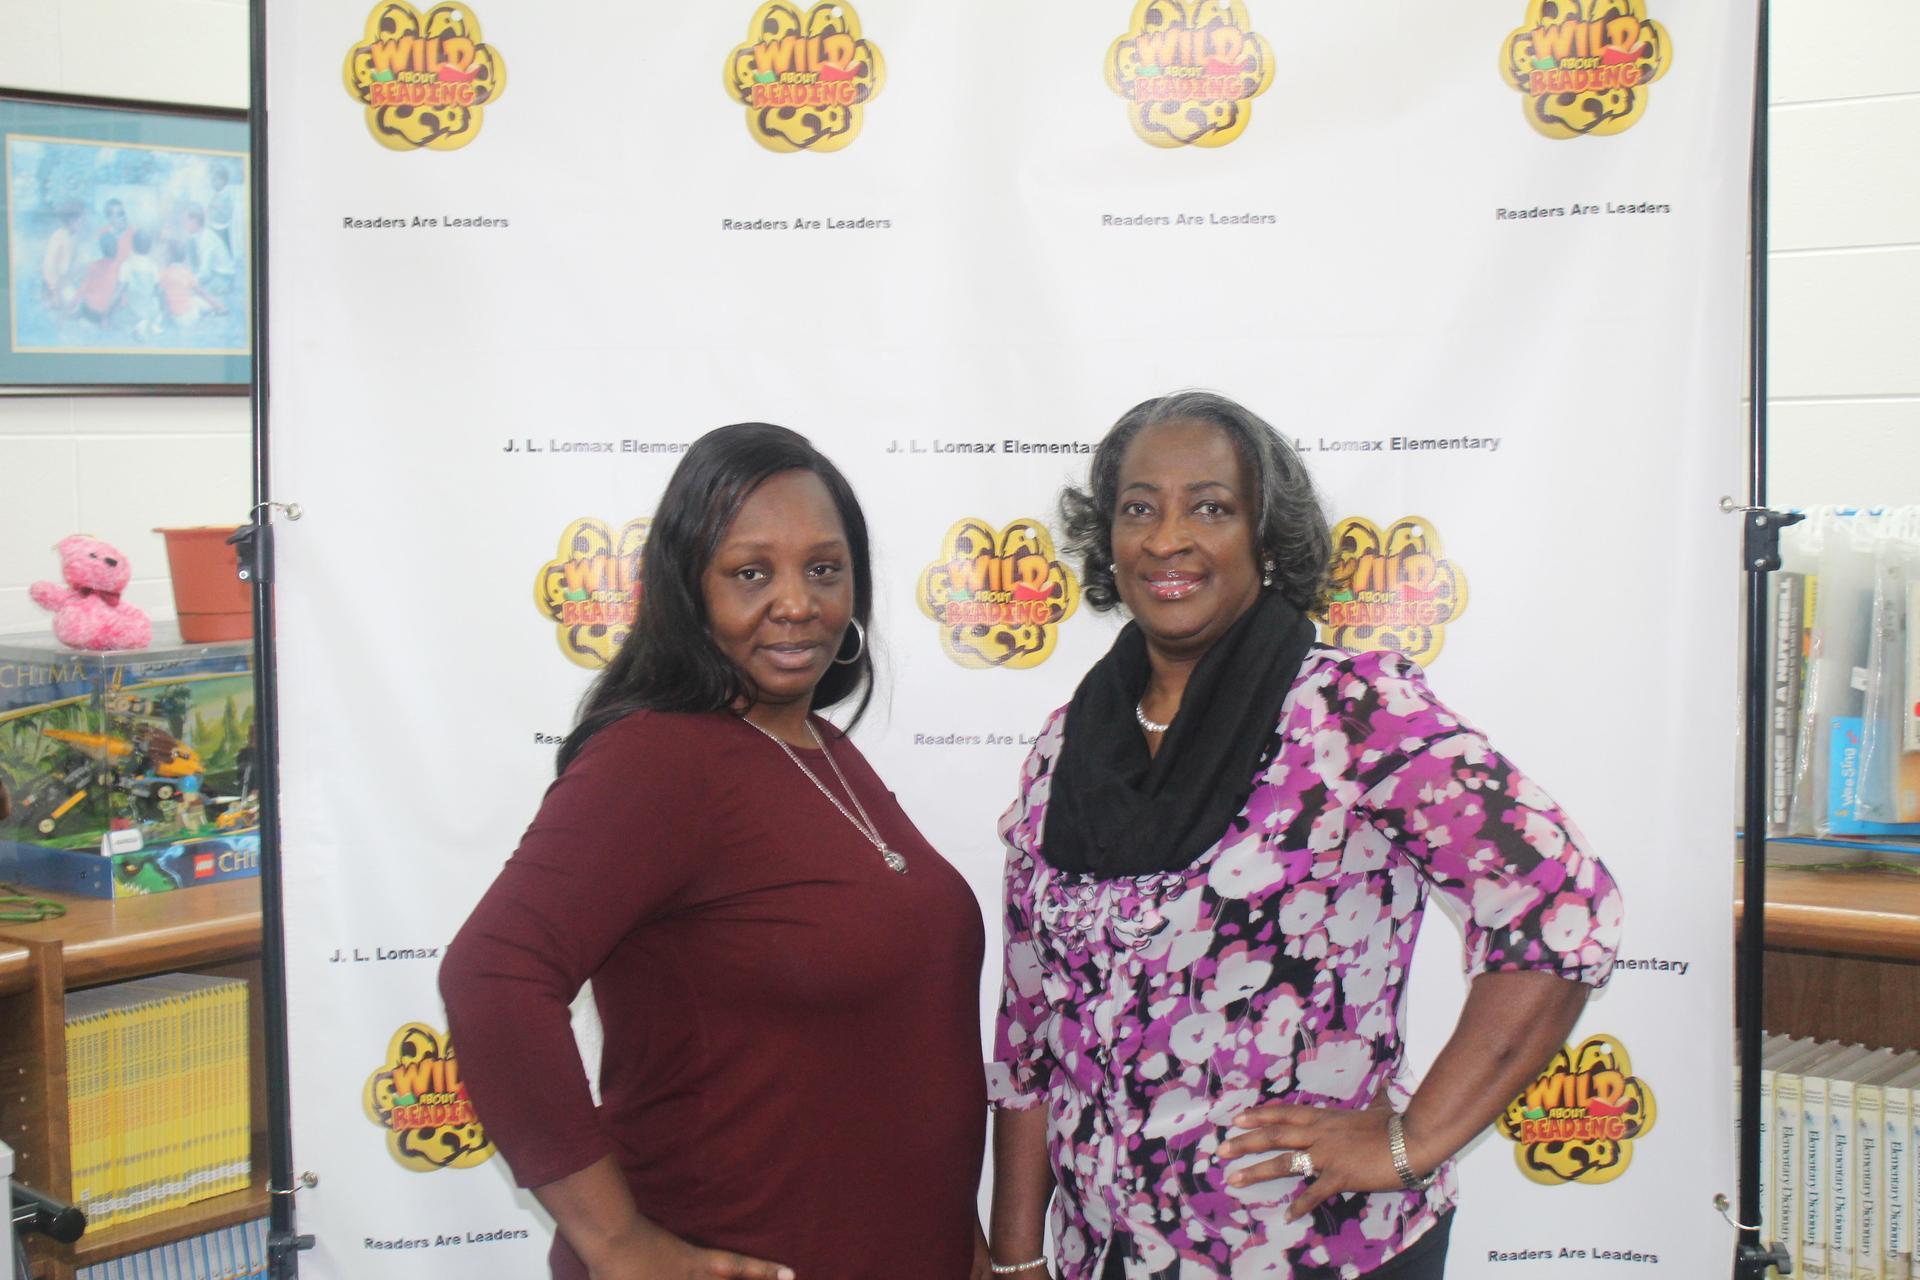 Ms Thomas, Media Clerk and Mrs. Sermons, Media Specialist